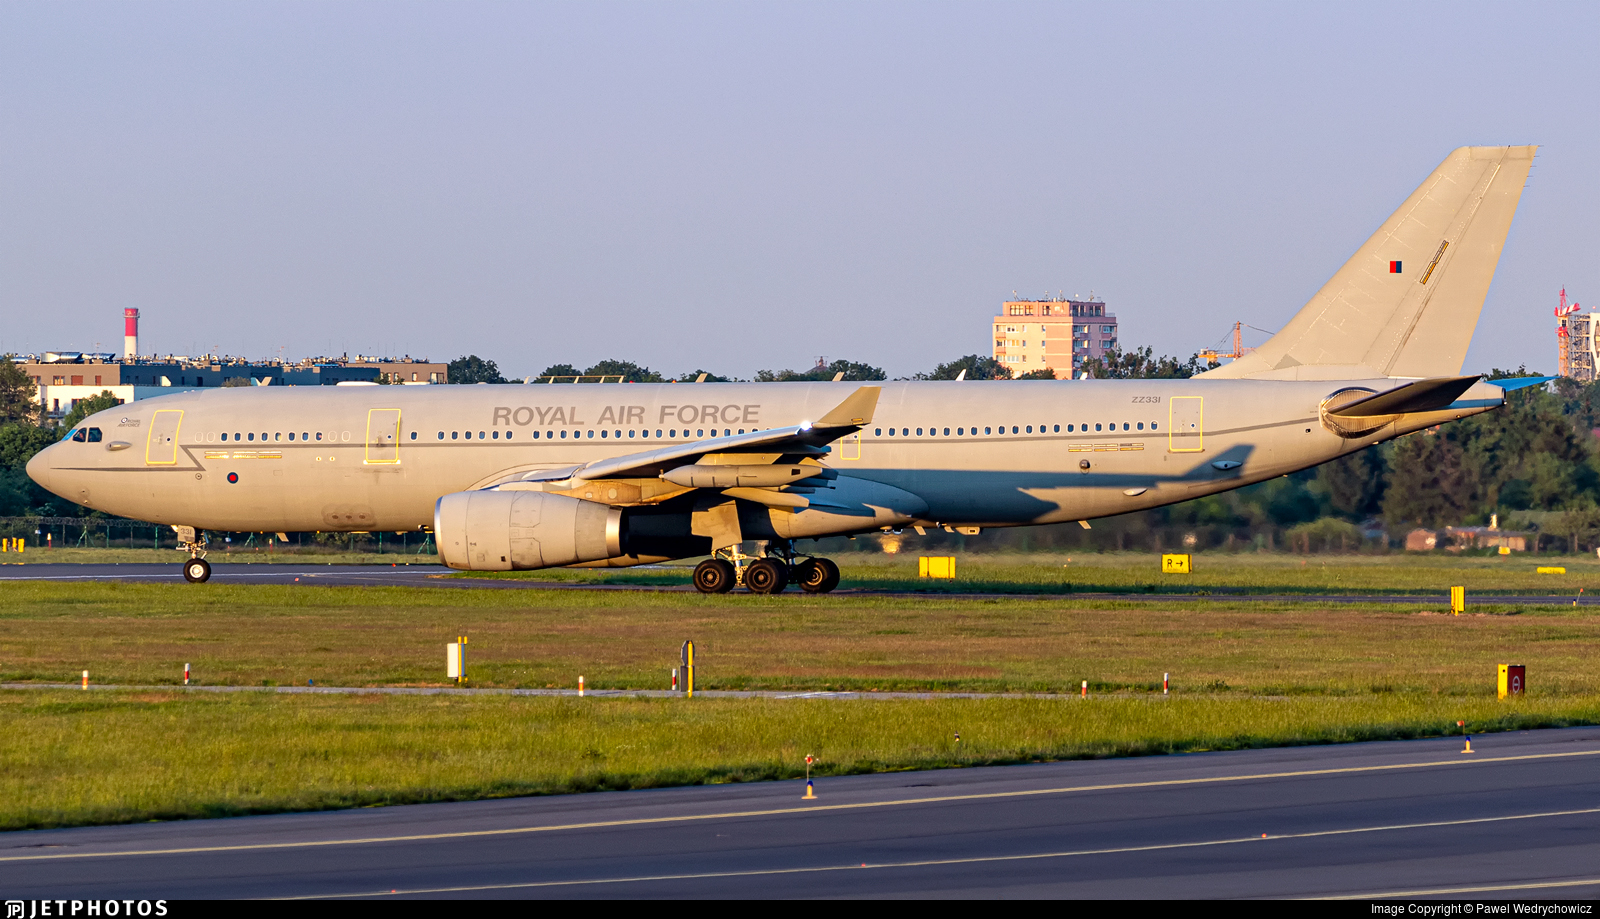 ZZ331 - Airbus A330-243 (MRTT) Voyager KC.2 - United Kingdom - Royal Air Force (RAF)